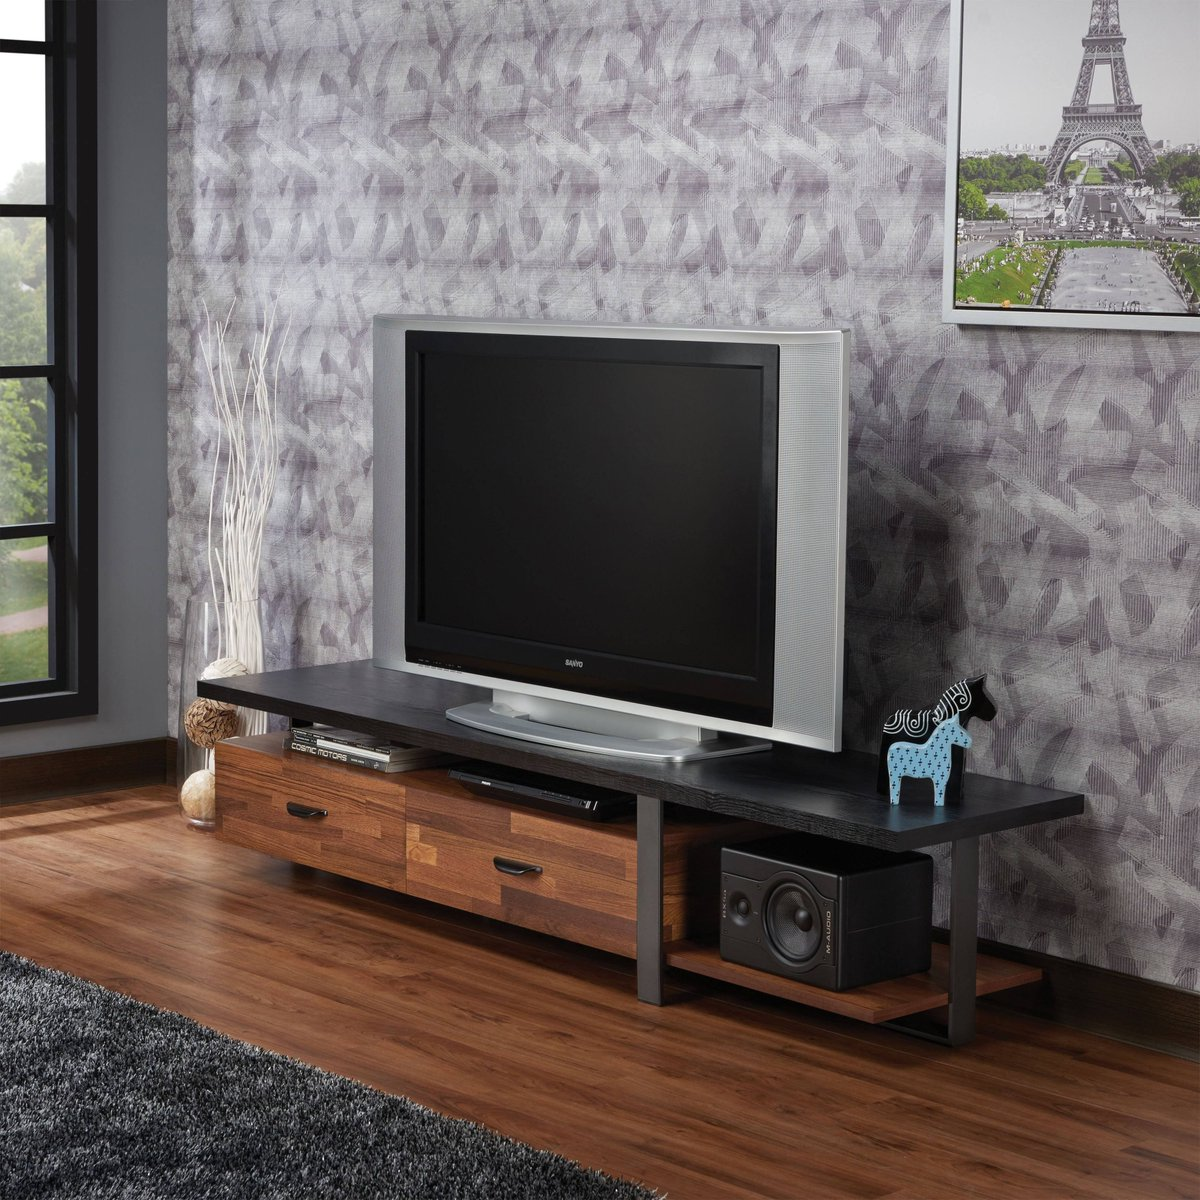 Enjoy your quarantine days' binge-watching your favorite shows. SHOP NOW @ https://buff.ly/2QQg7Bo  http://Benzara.com  Follow Us #Benzara . . . #furniture #TVconsole #Mediacabinet #moderndecor #modernfurniture #modernlook #smmakelifebeautiful #inspiremeneutral #mybohopic.twitter.com/KZ5xPx3doR